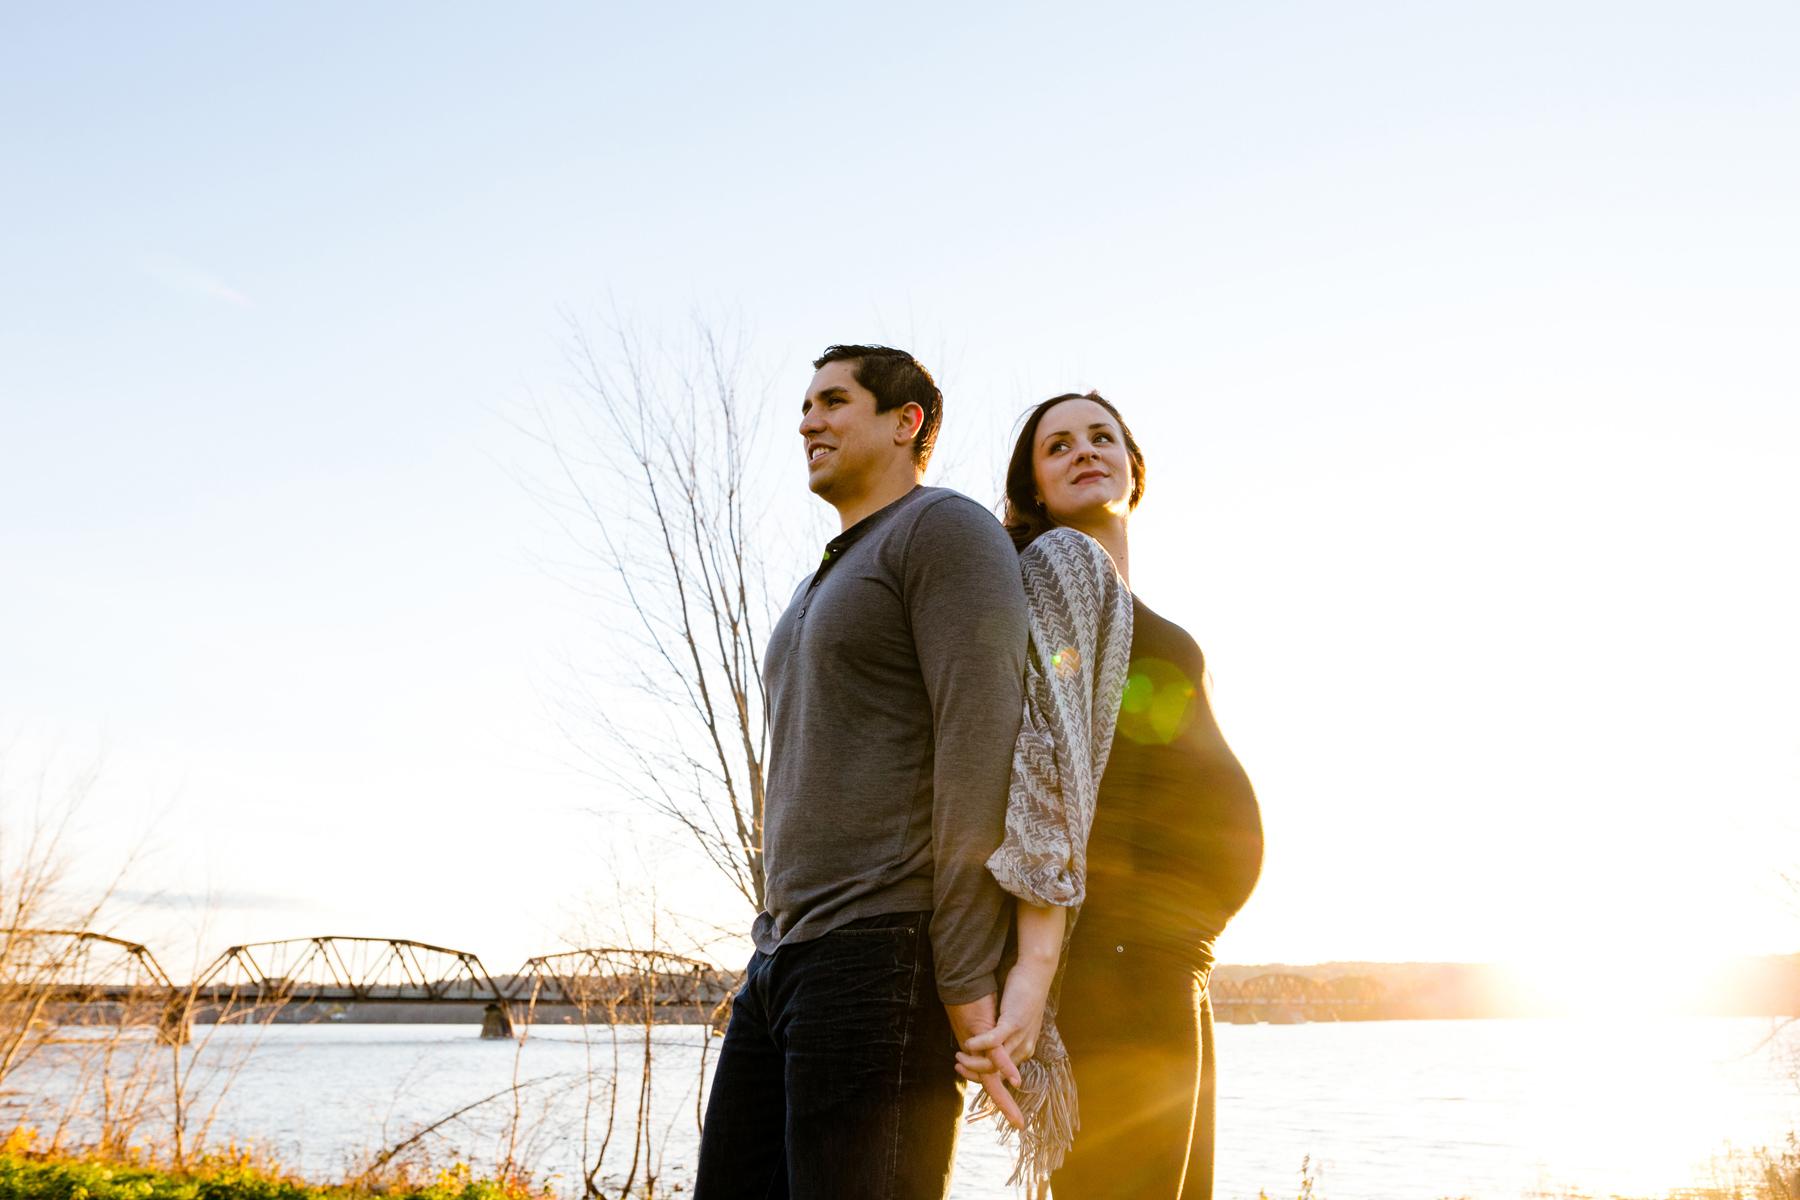 016-amazing-maternity-photos-fredericton-photography-kandisebrown-ka2017